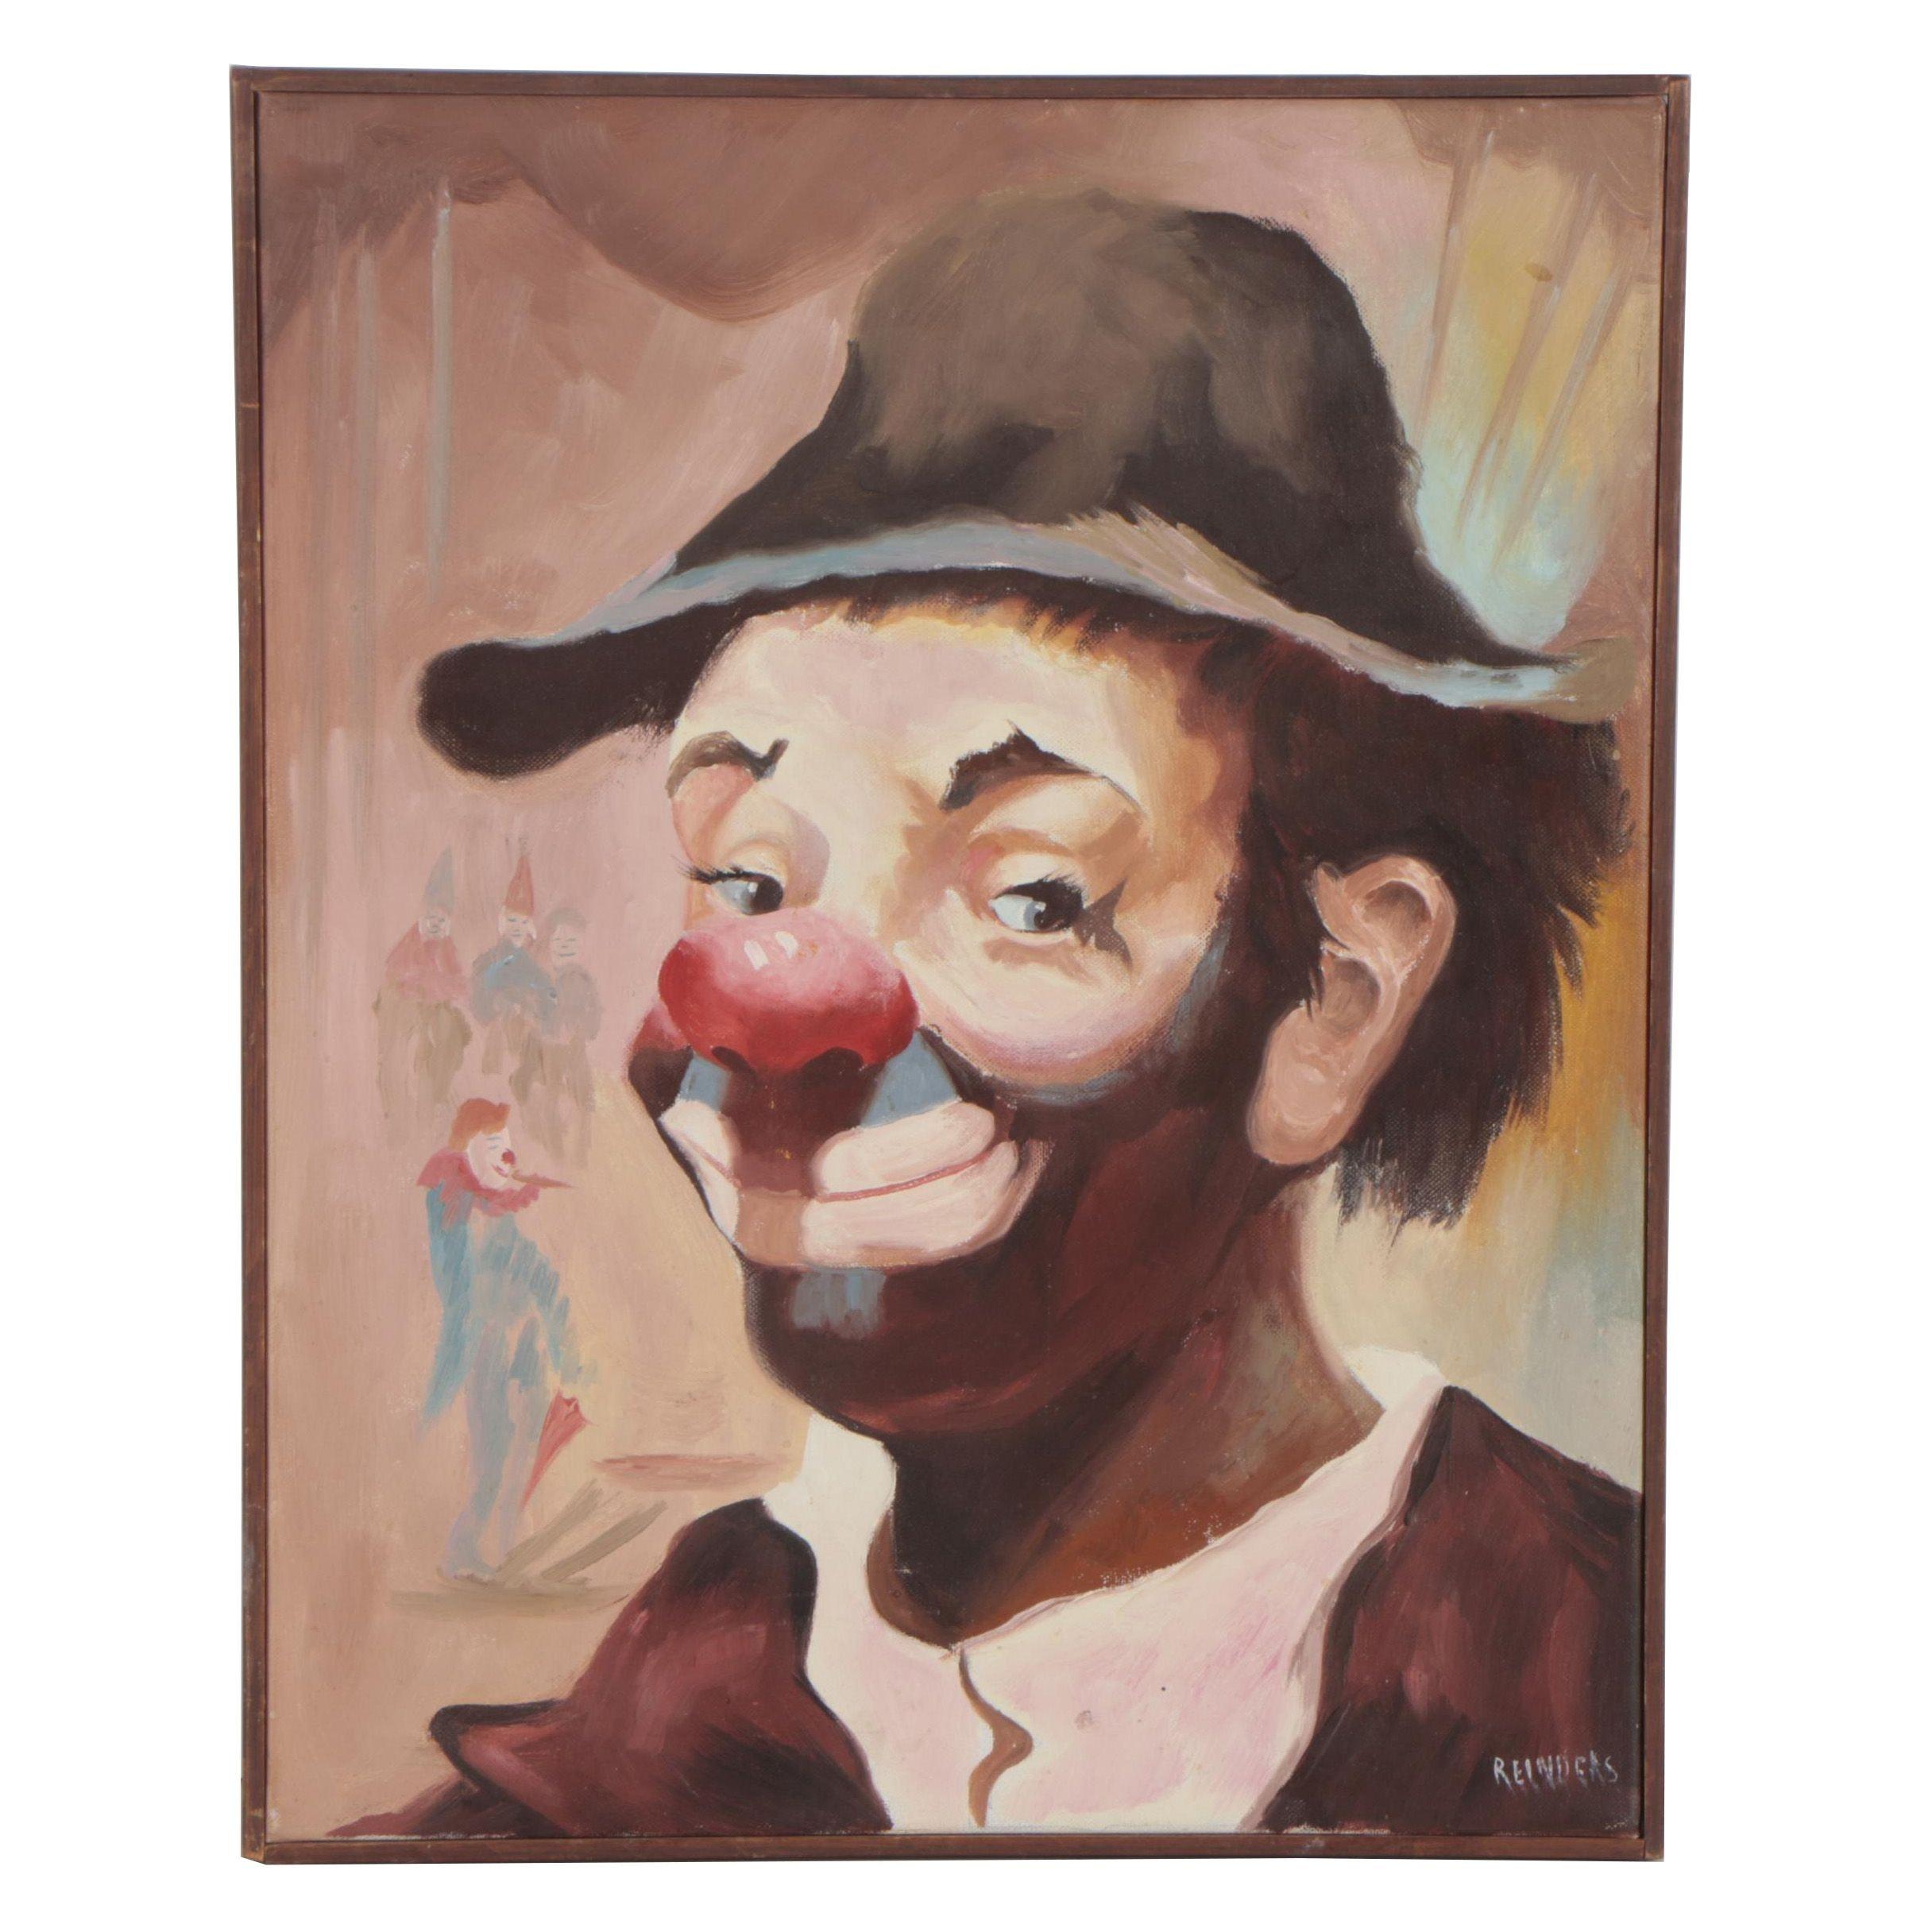 Reinders Oil Painting Portrait of Clown